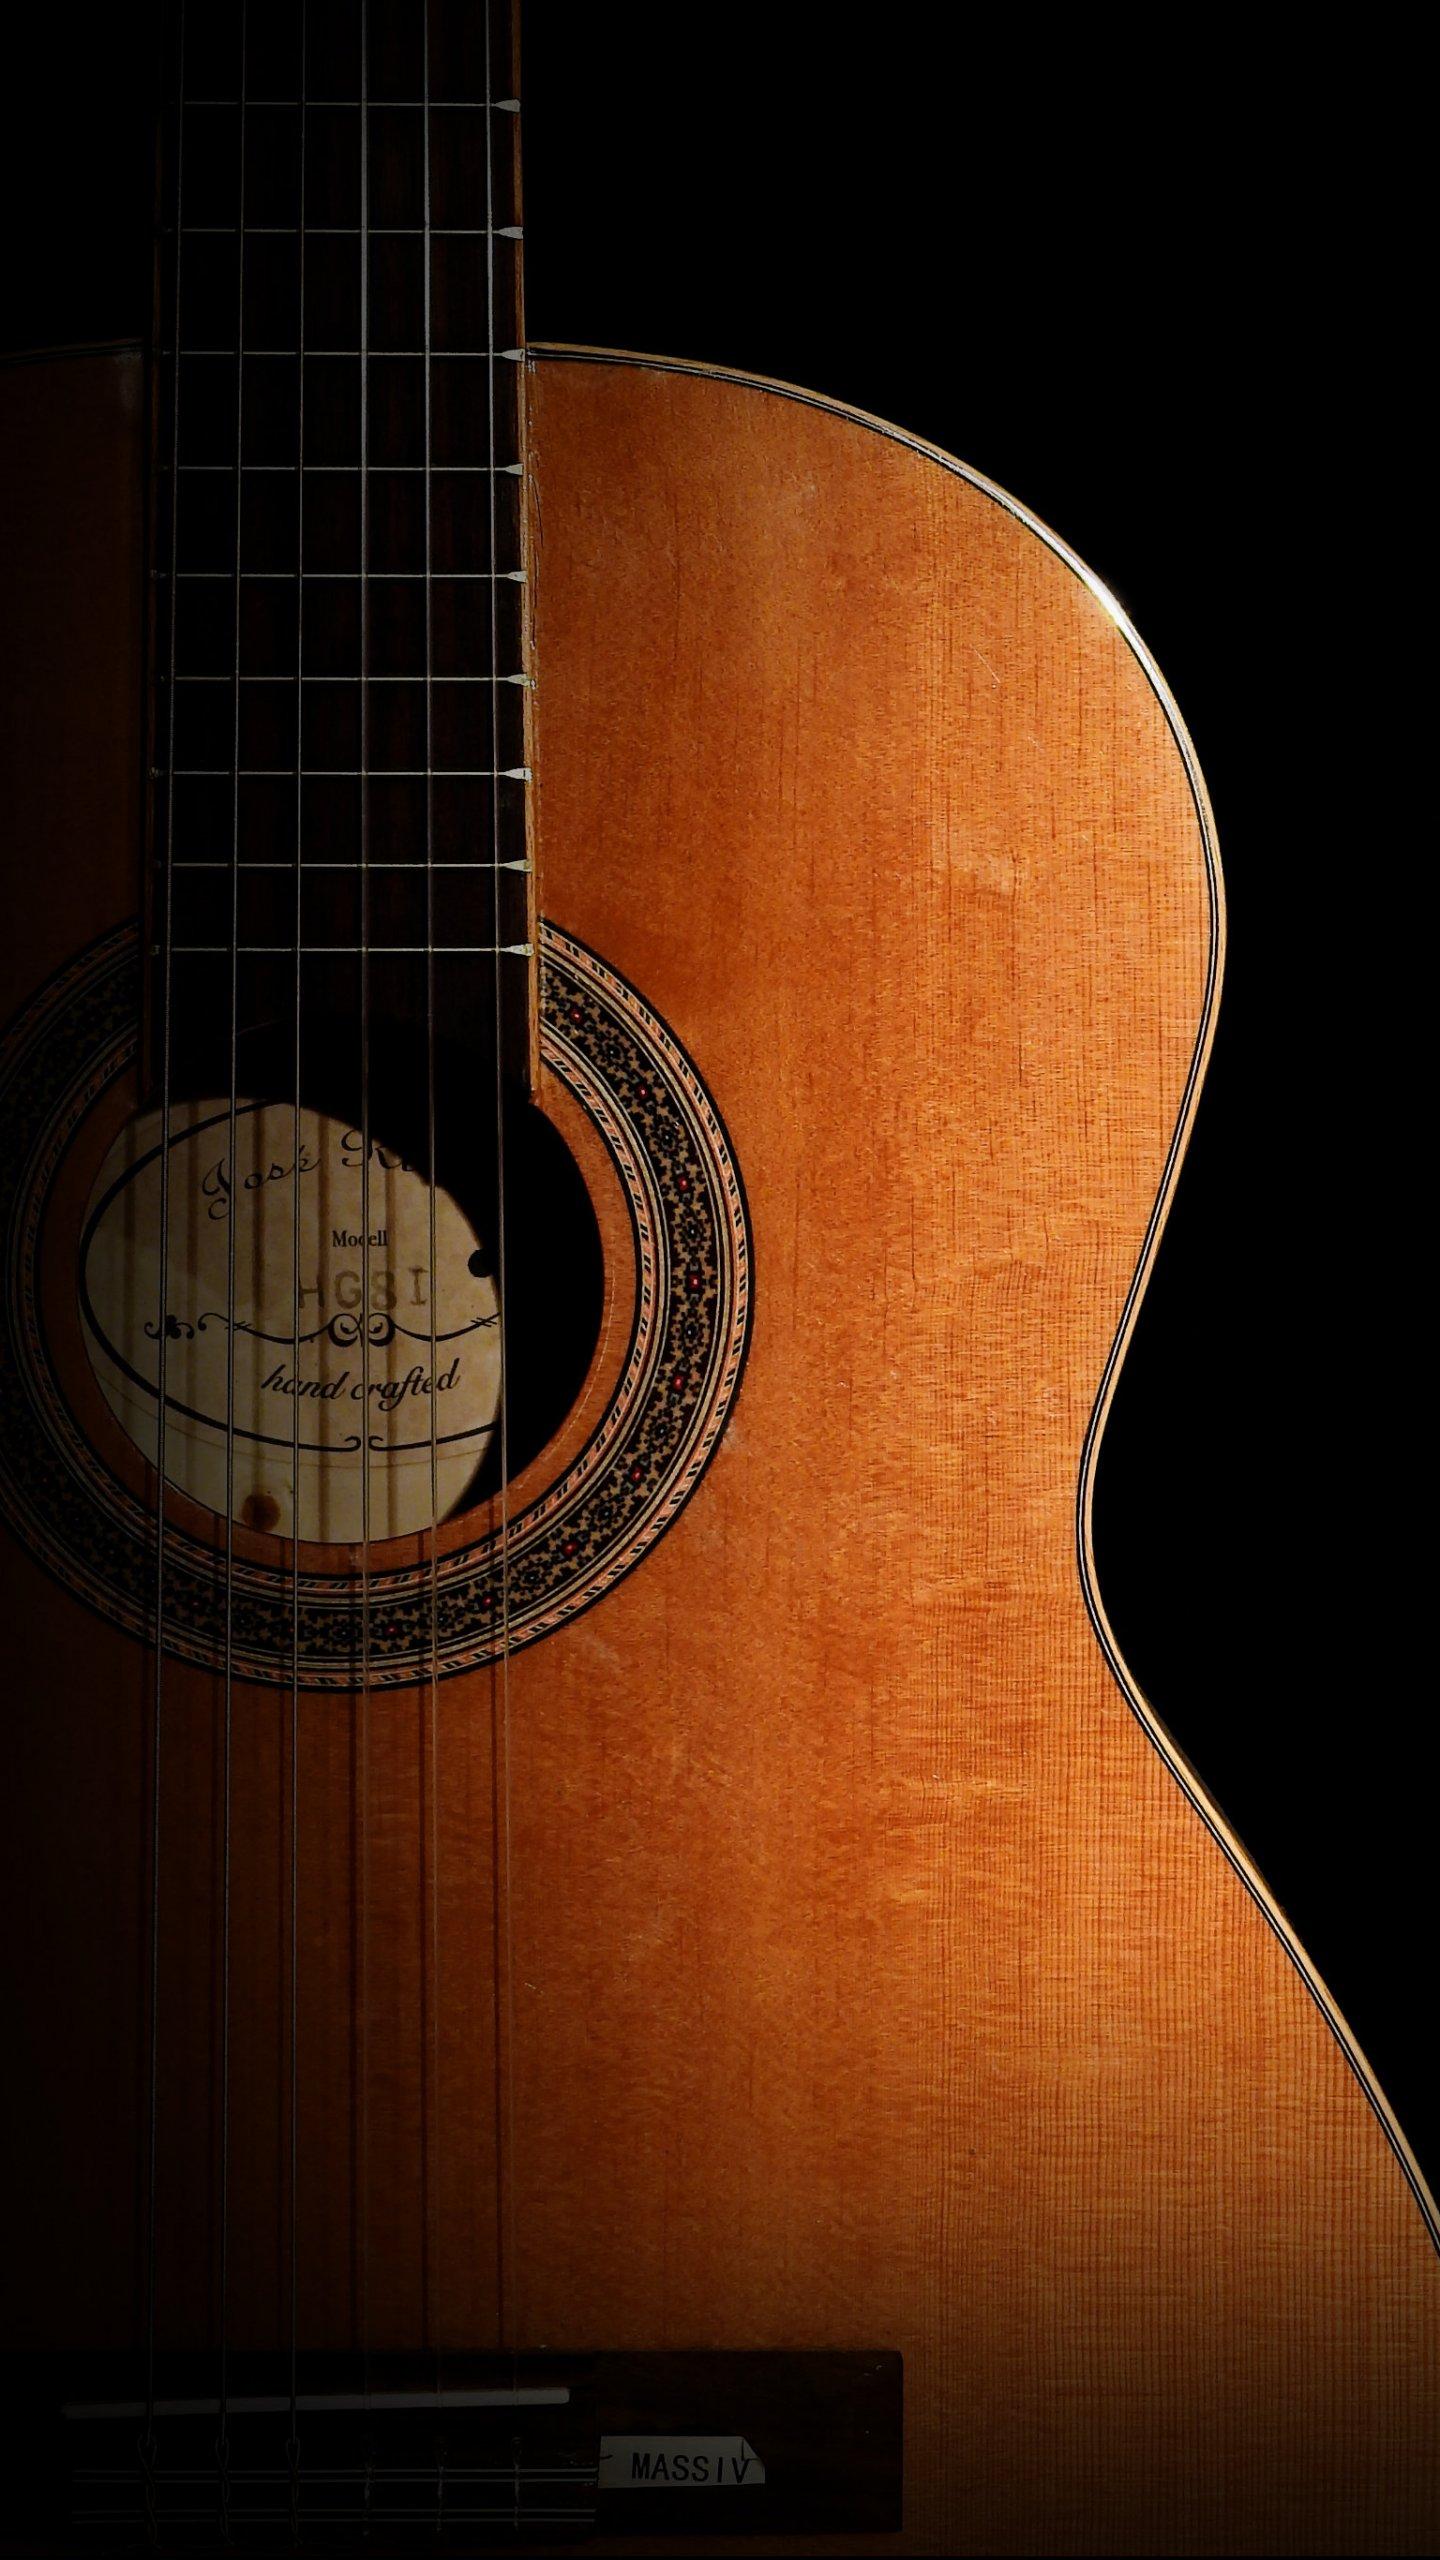 Guitar Wallpaper Iphone Android Desktop Backgrounds